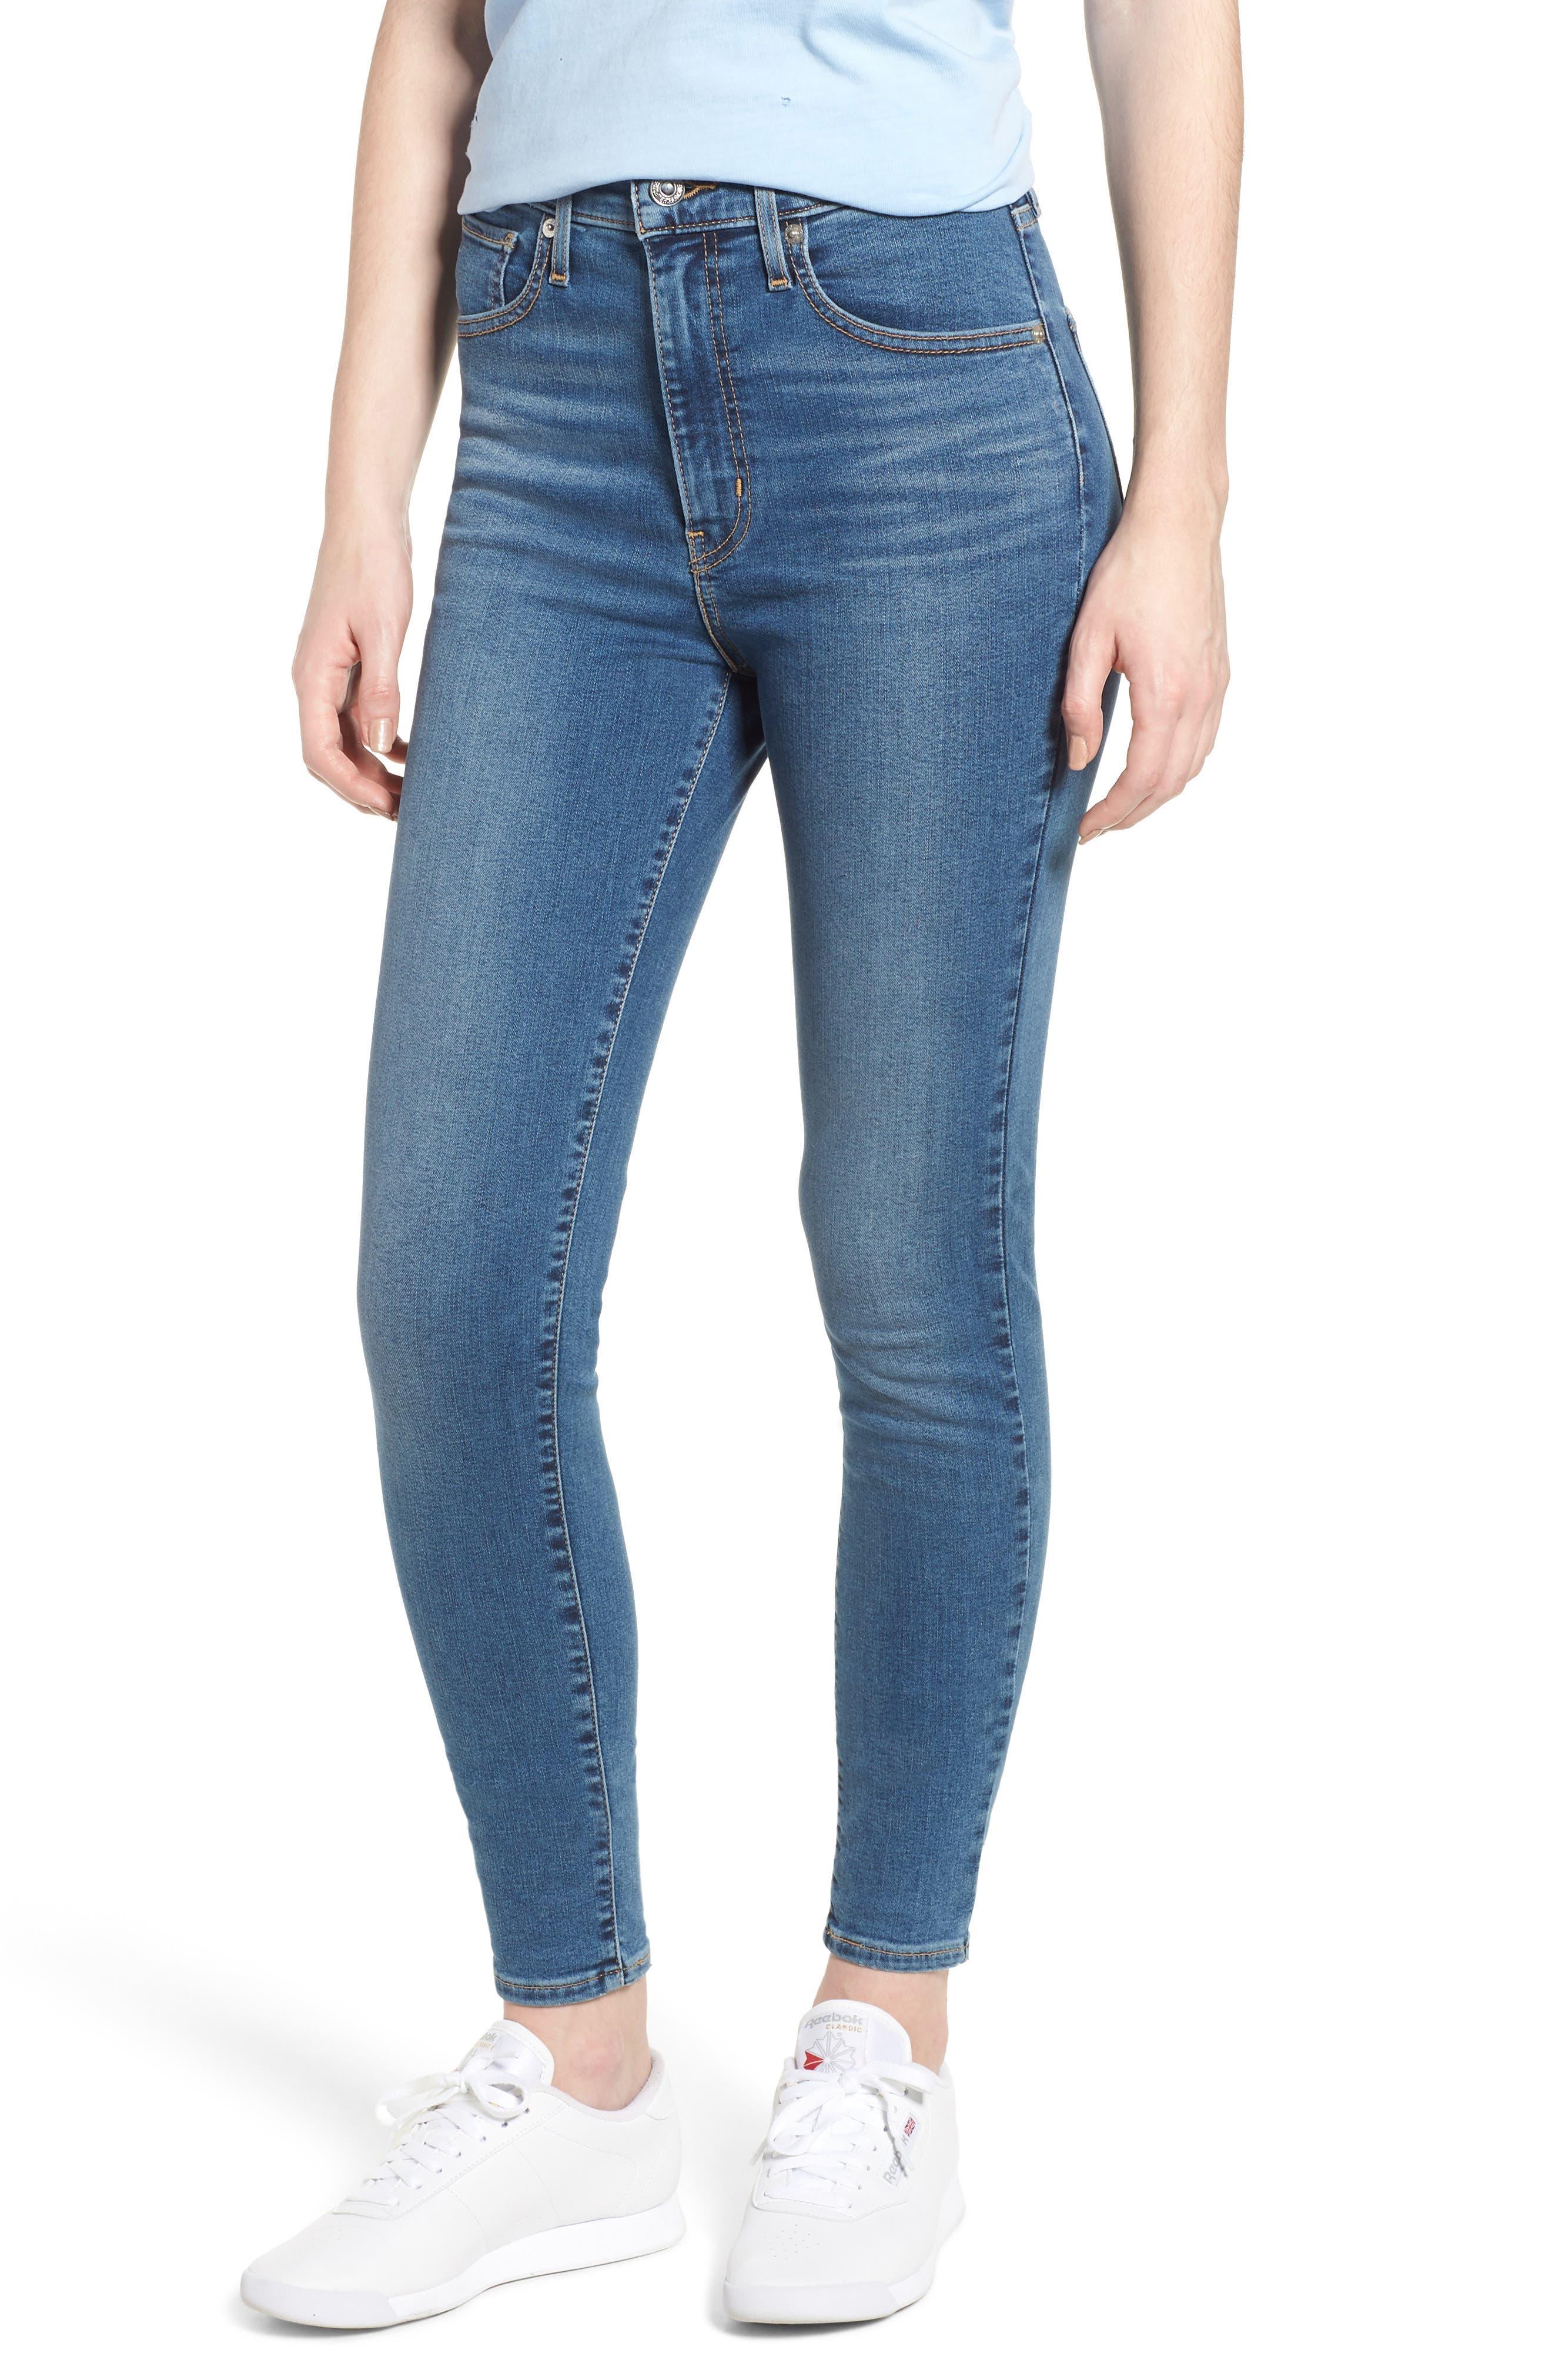 Mile High Super Skinny Jeans,                             Main thumbnail 1, color,                             MED BLUE 1